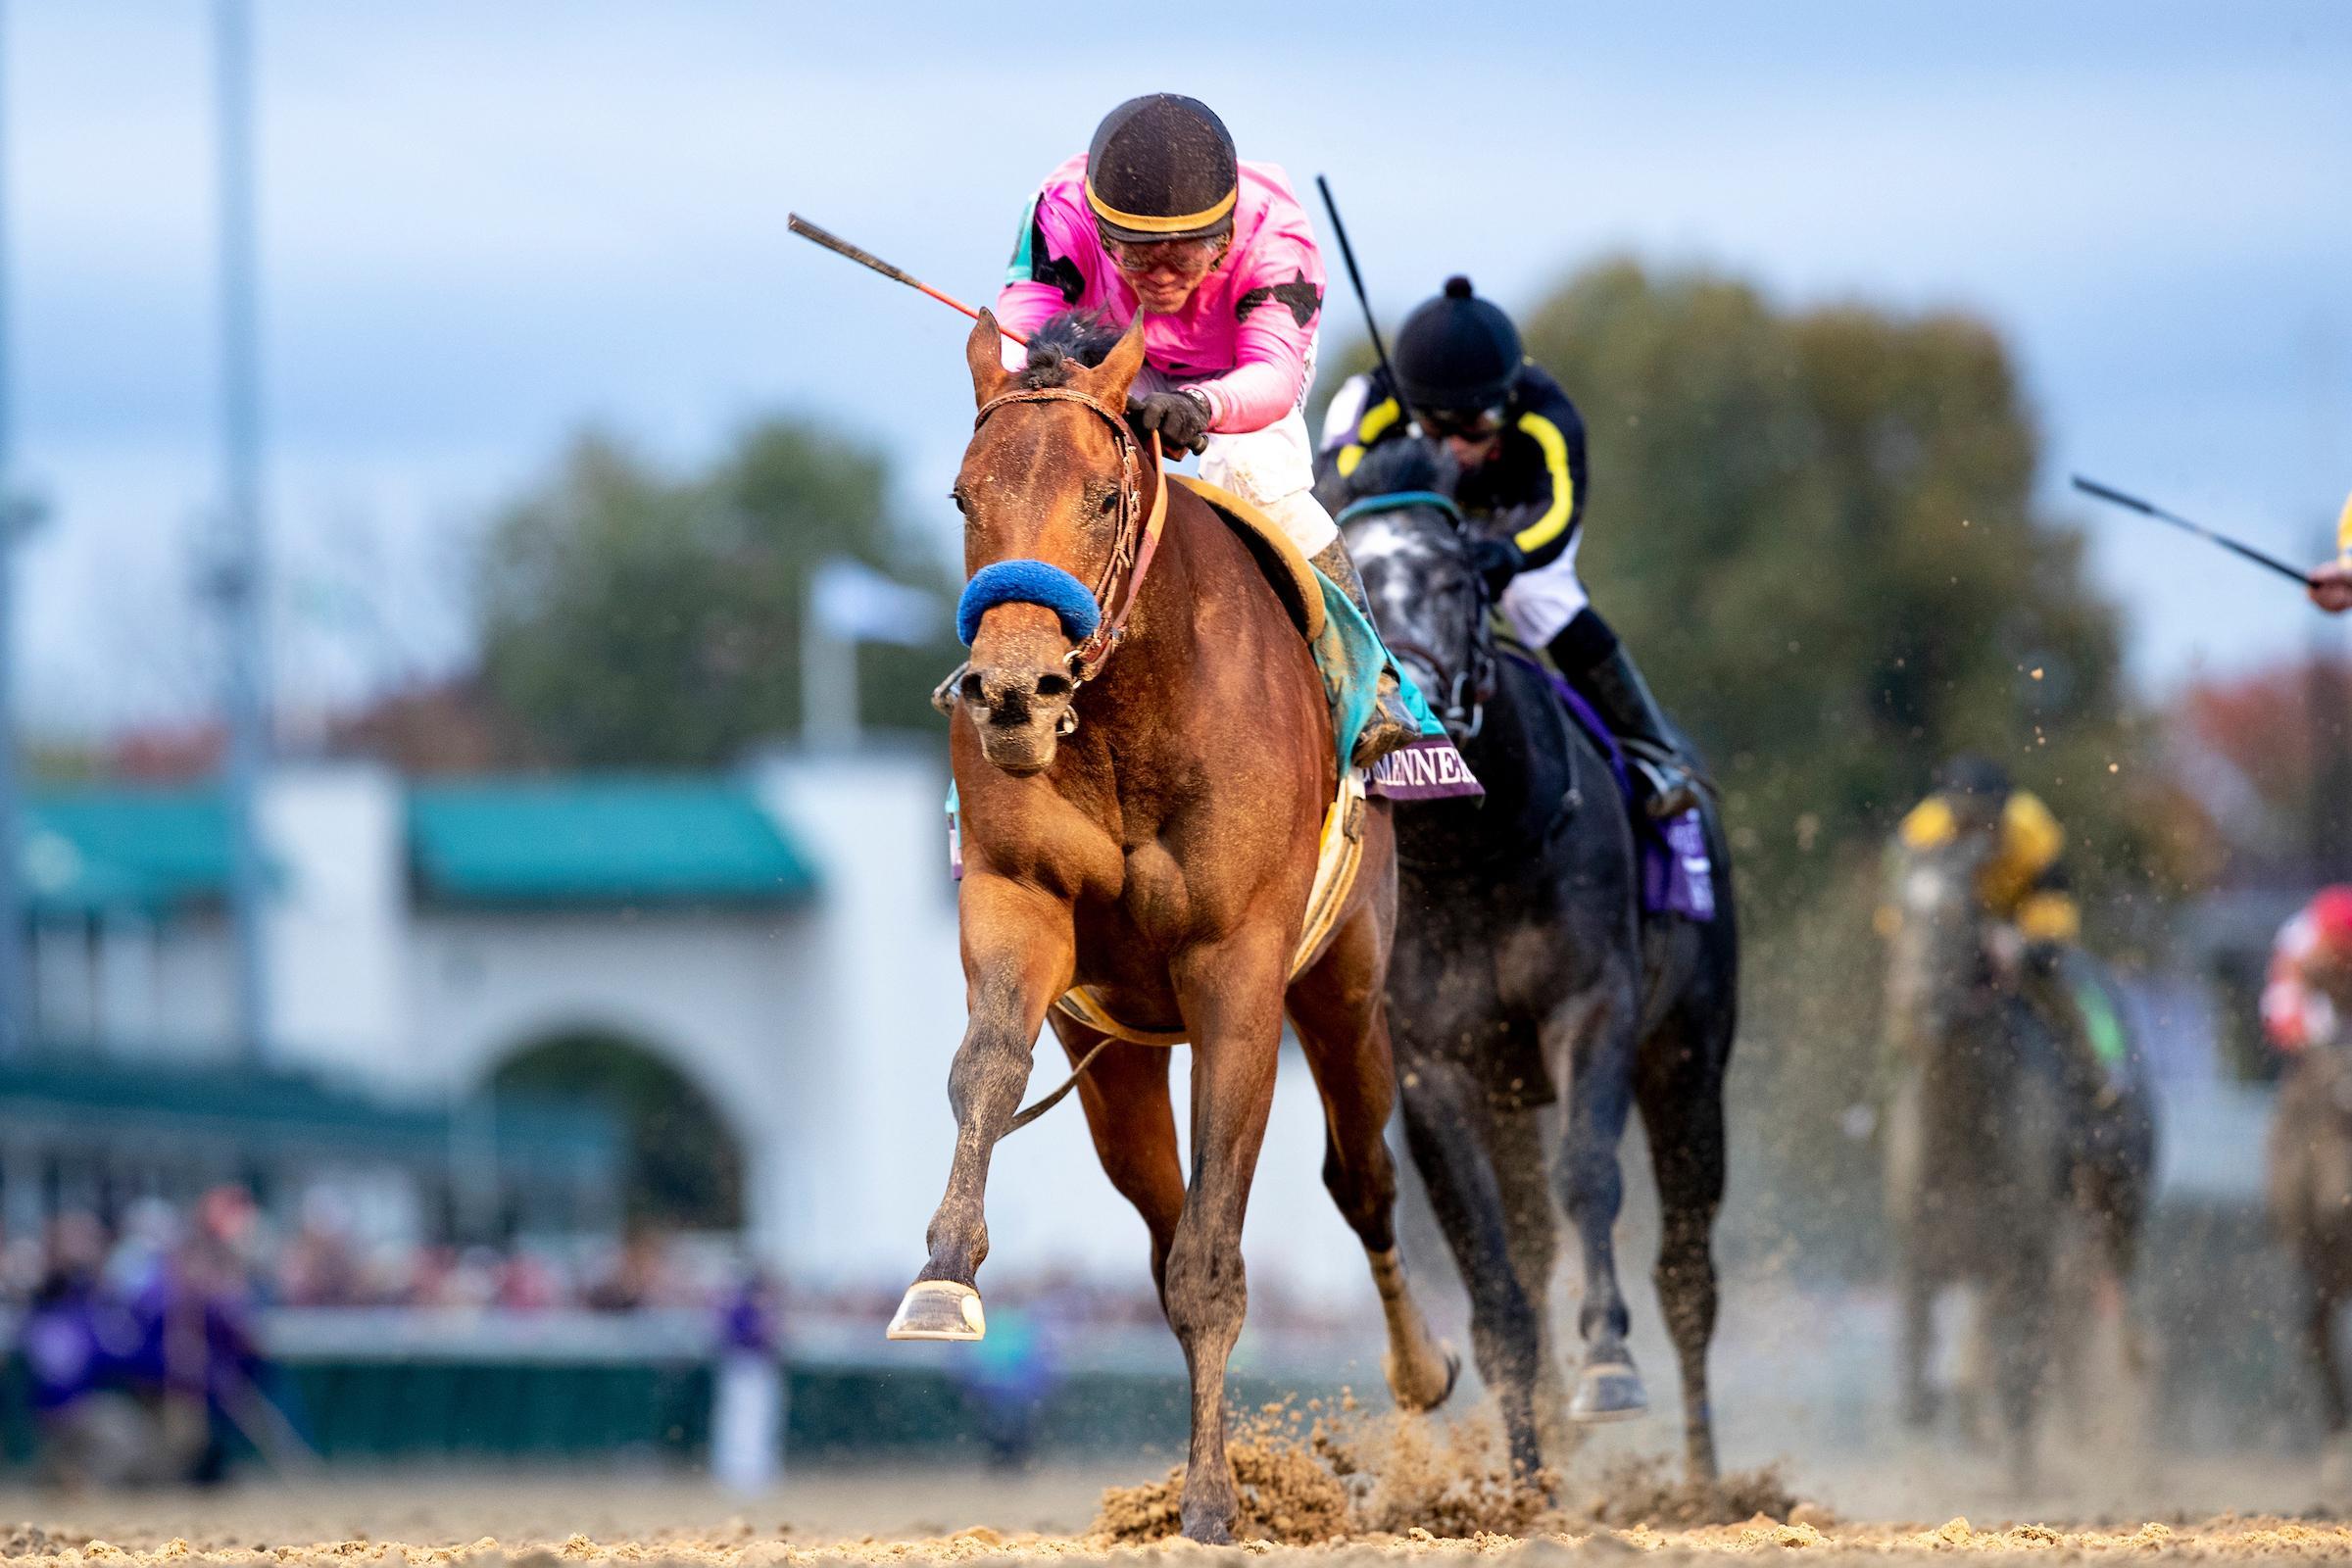 Sporting betting breeders lsu vs florida betting odds